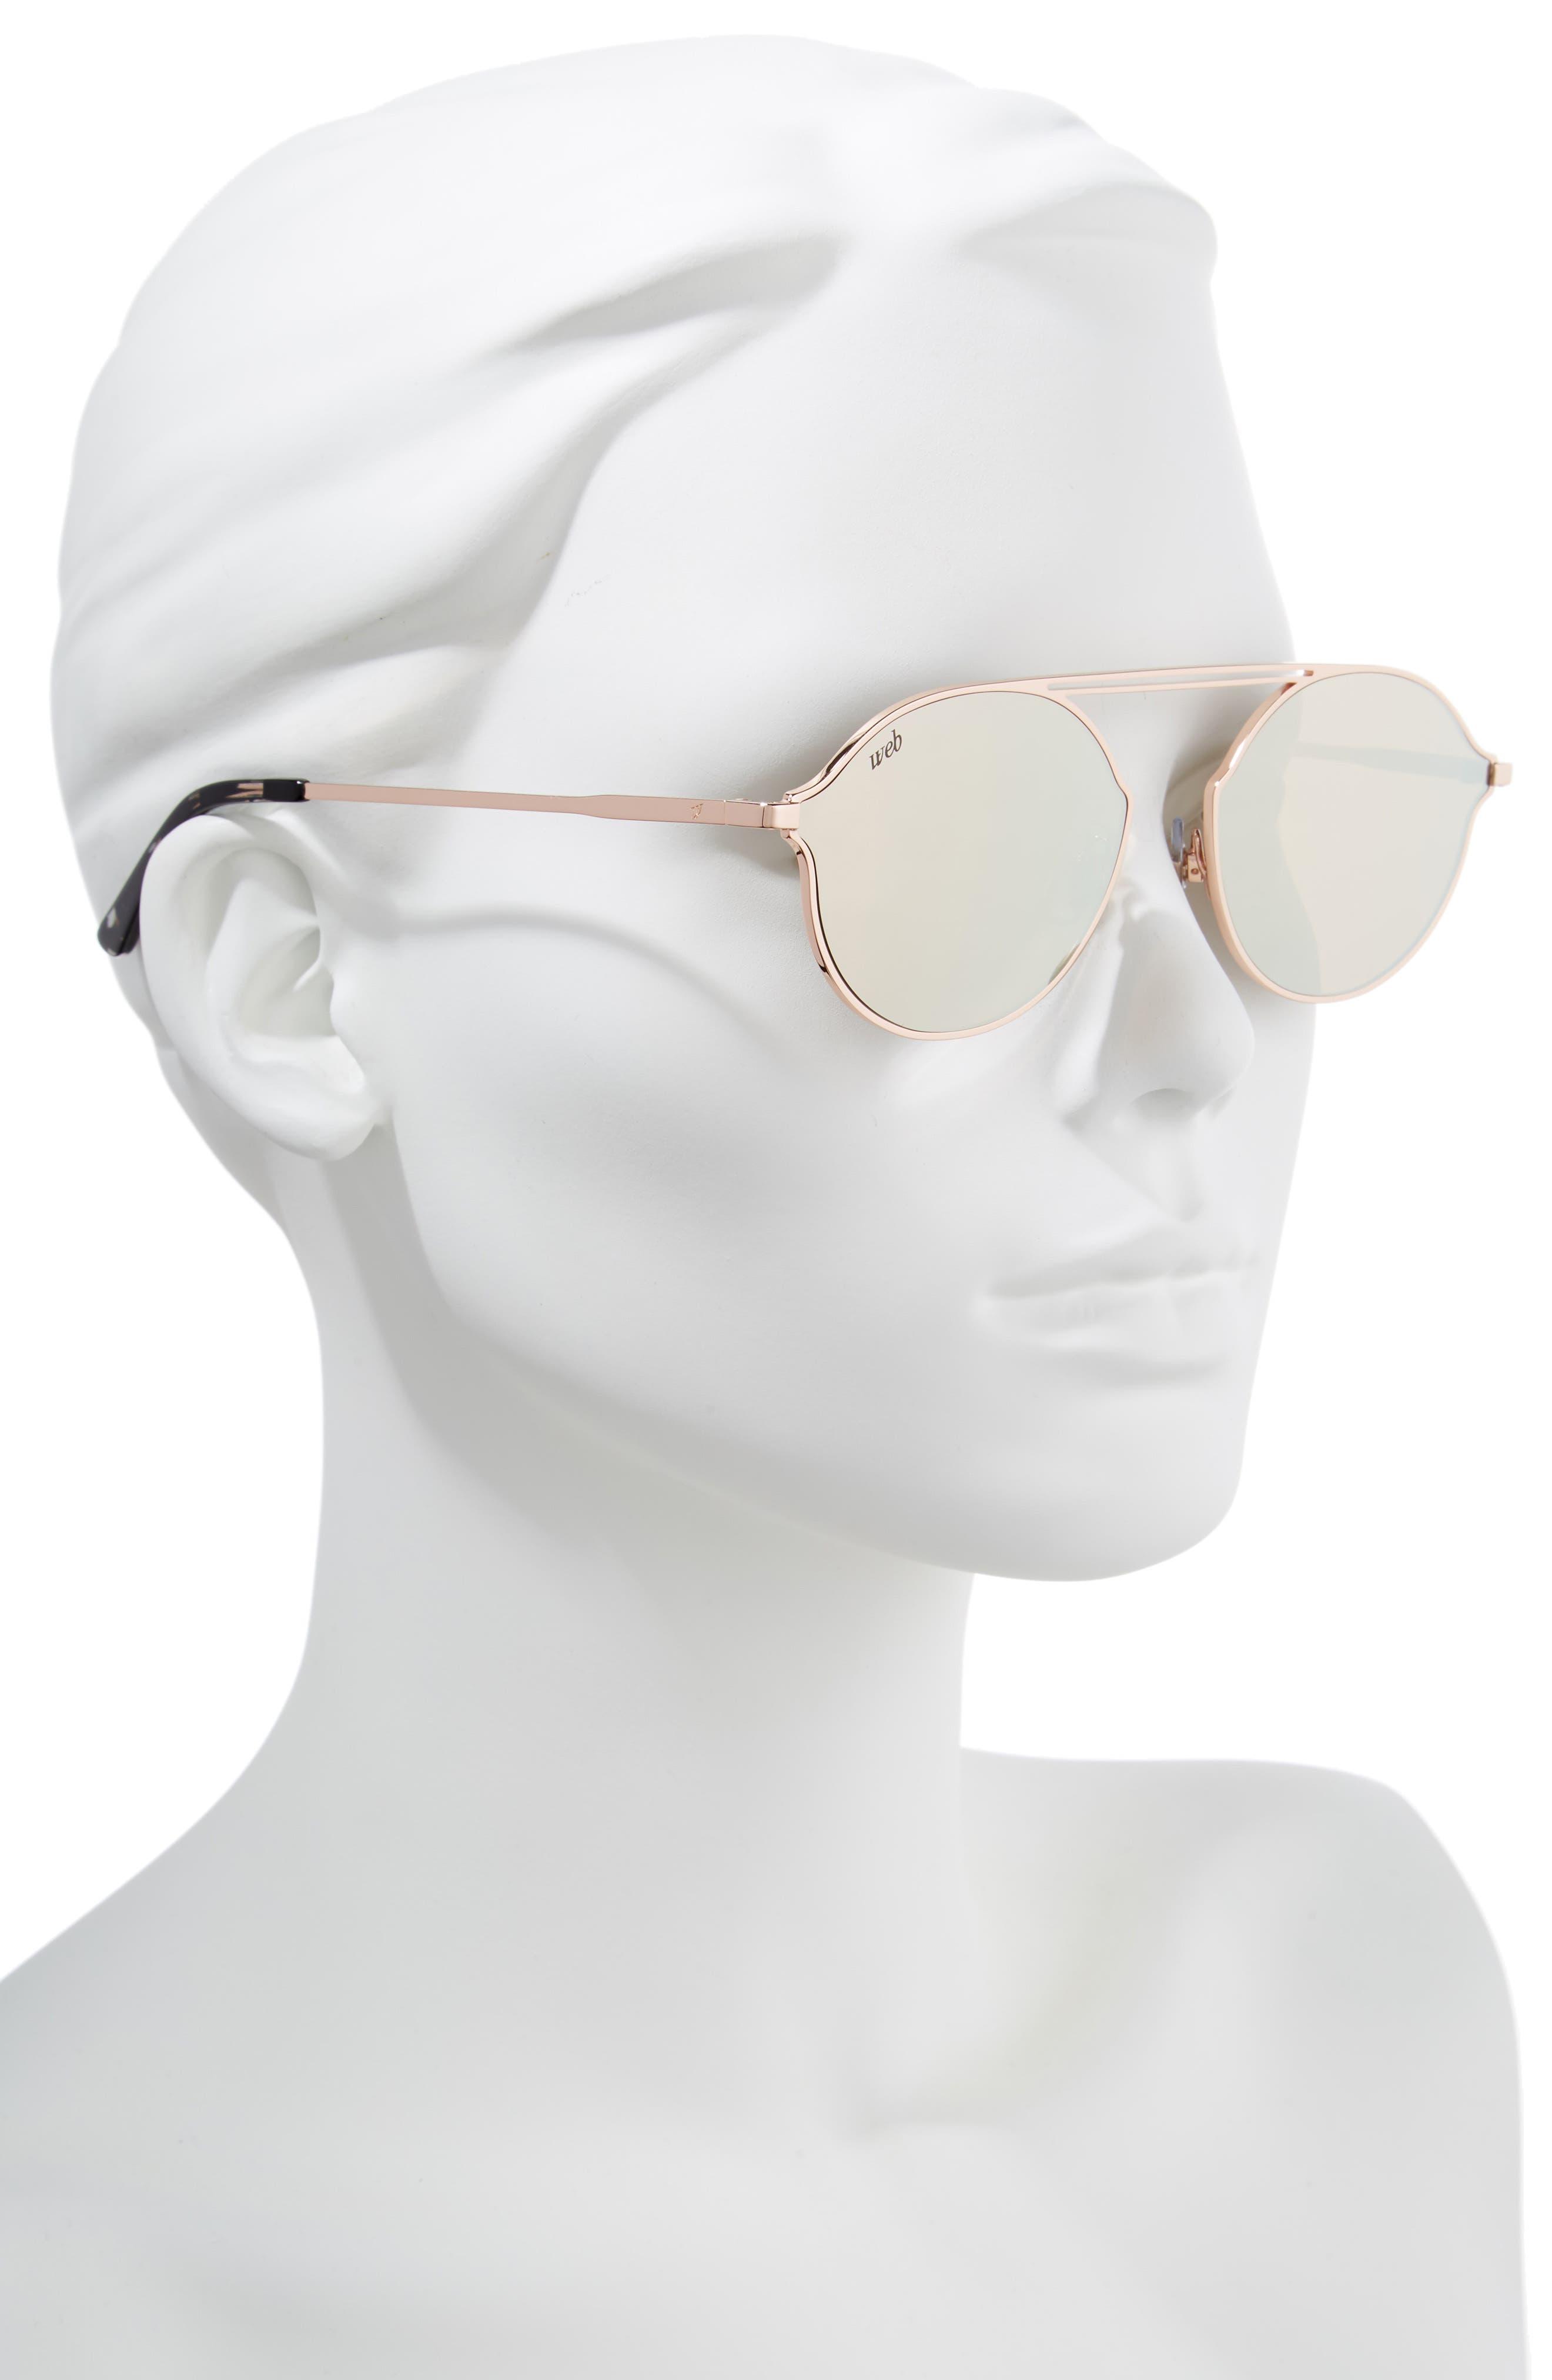 57mm Round Sunglasses,                             Alternate thumbnail 2, color,                             Light Bronze/ Brown Mirror